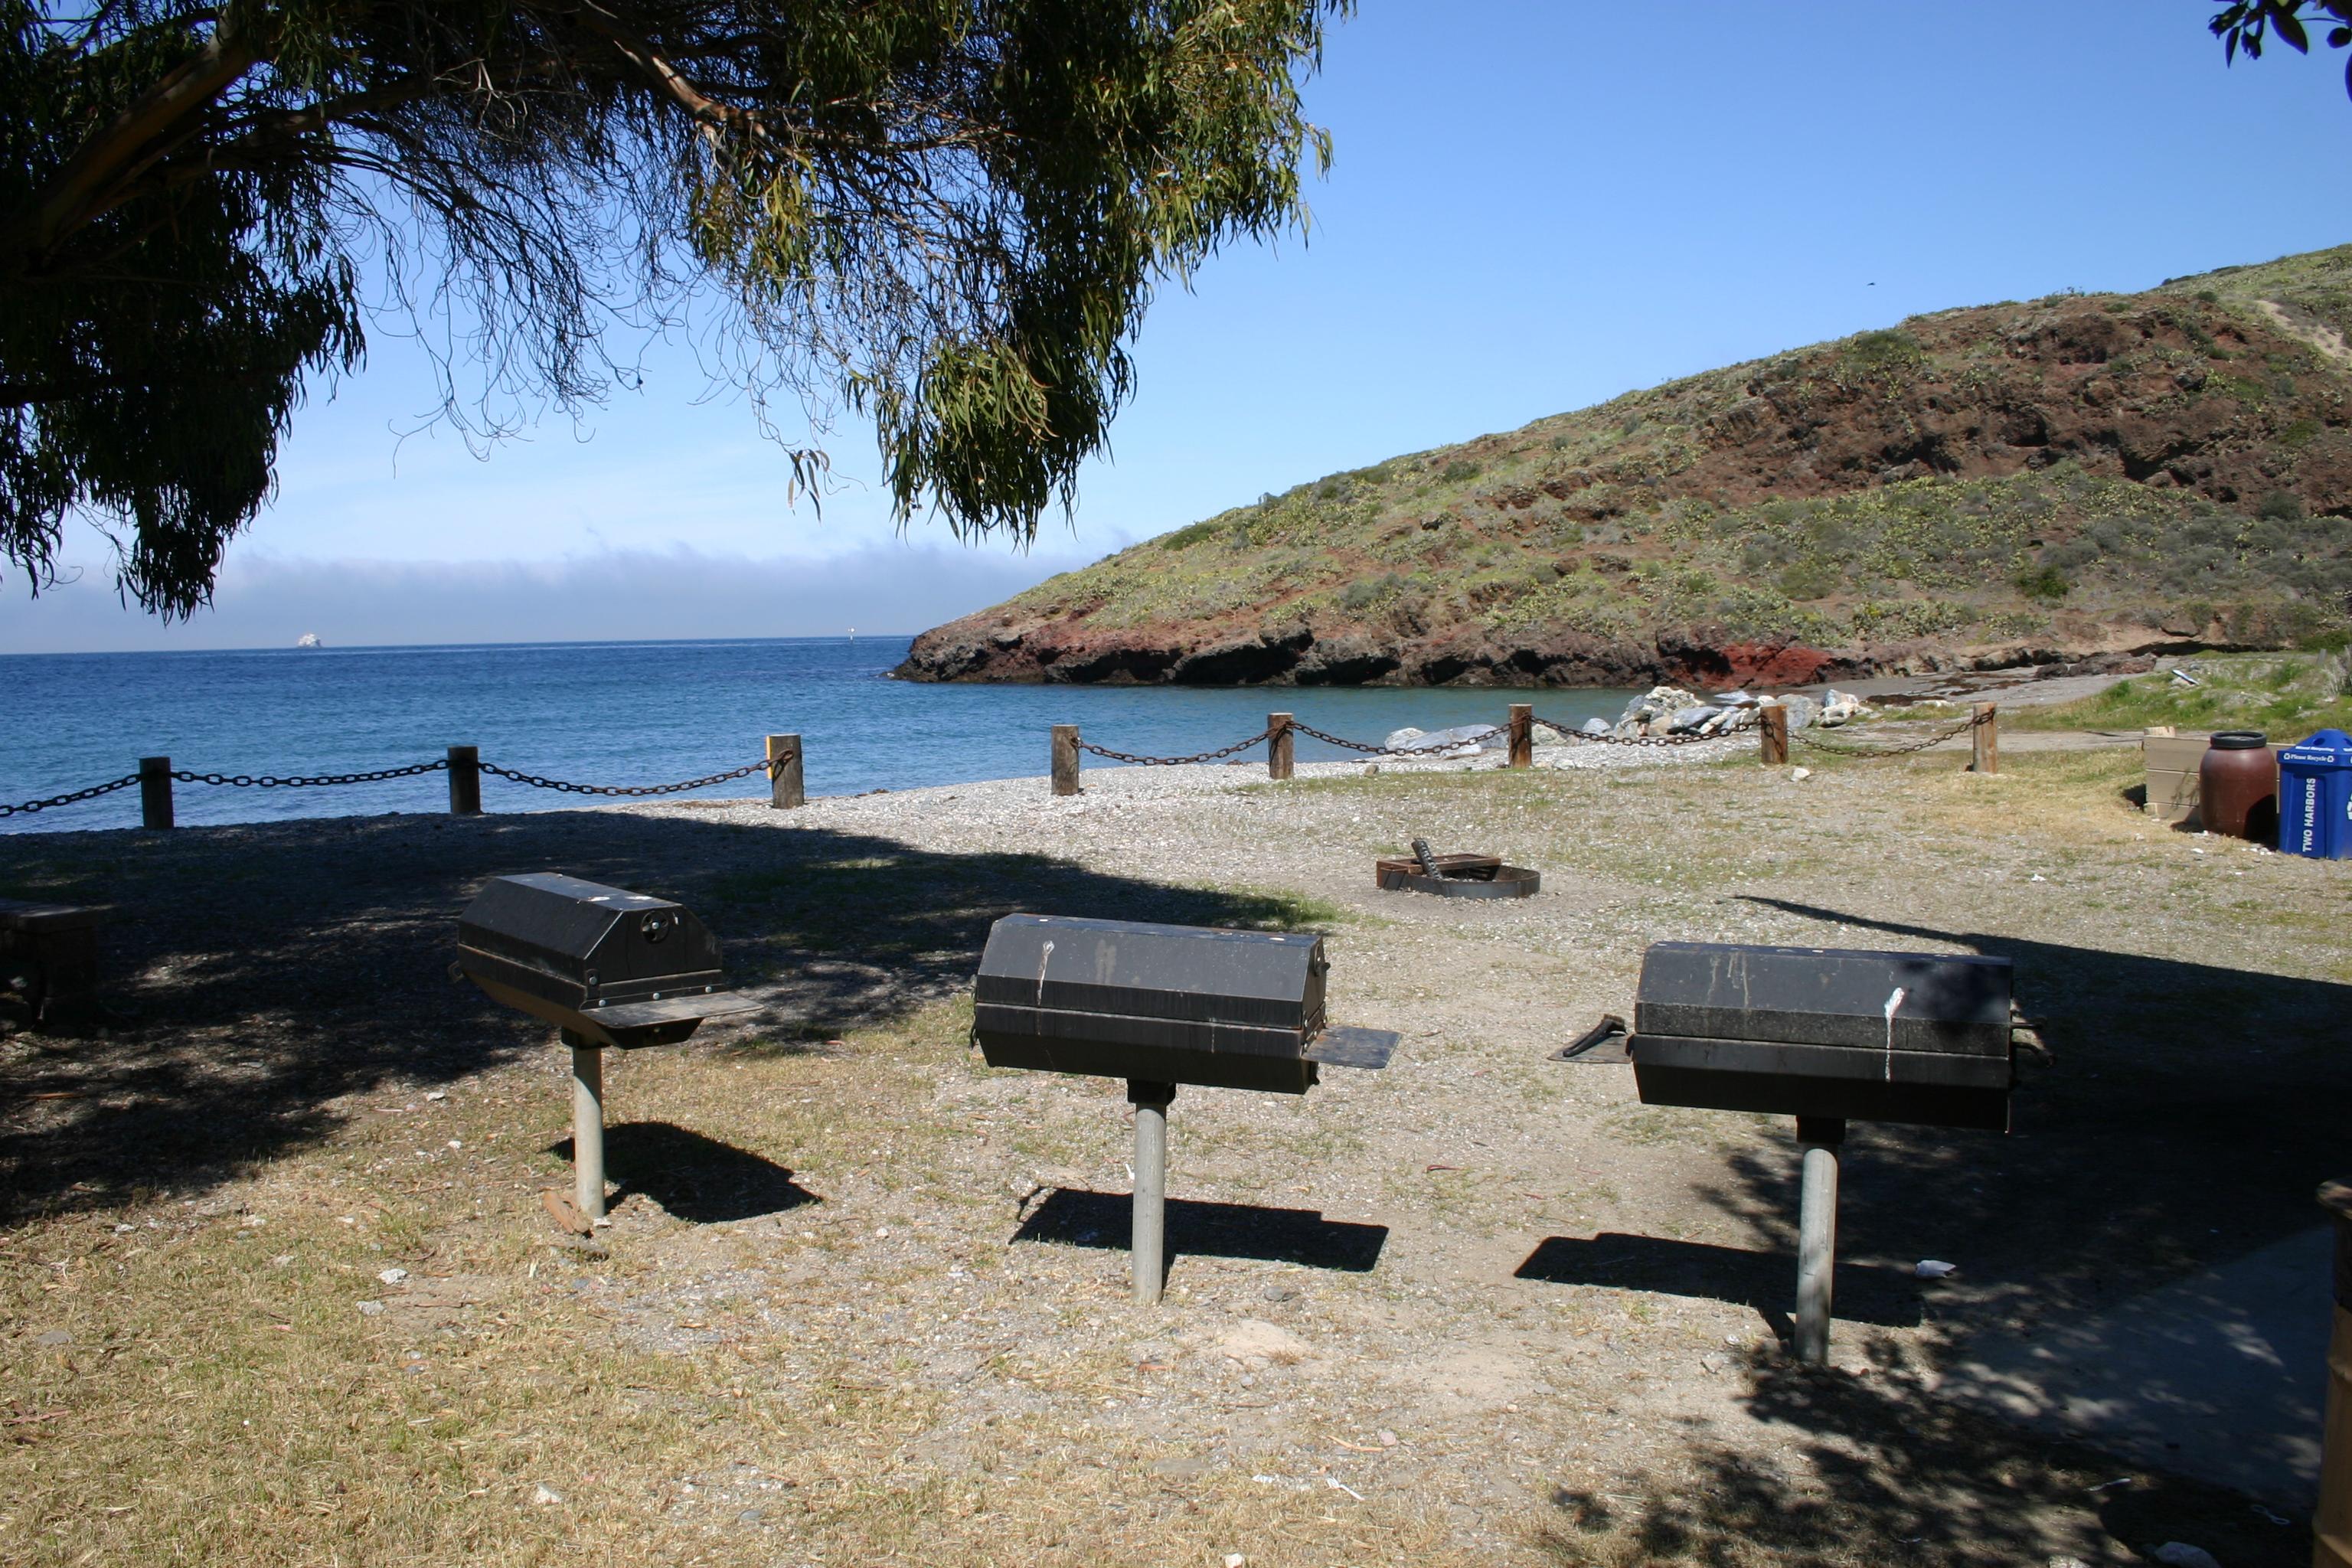 Brisas Del Mar Two Harbors Camping Visit Catalina Island